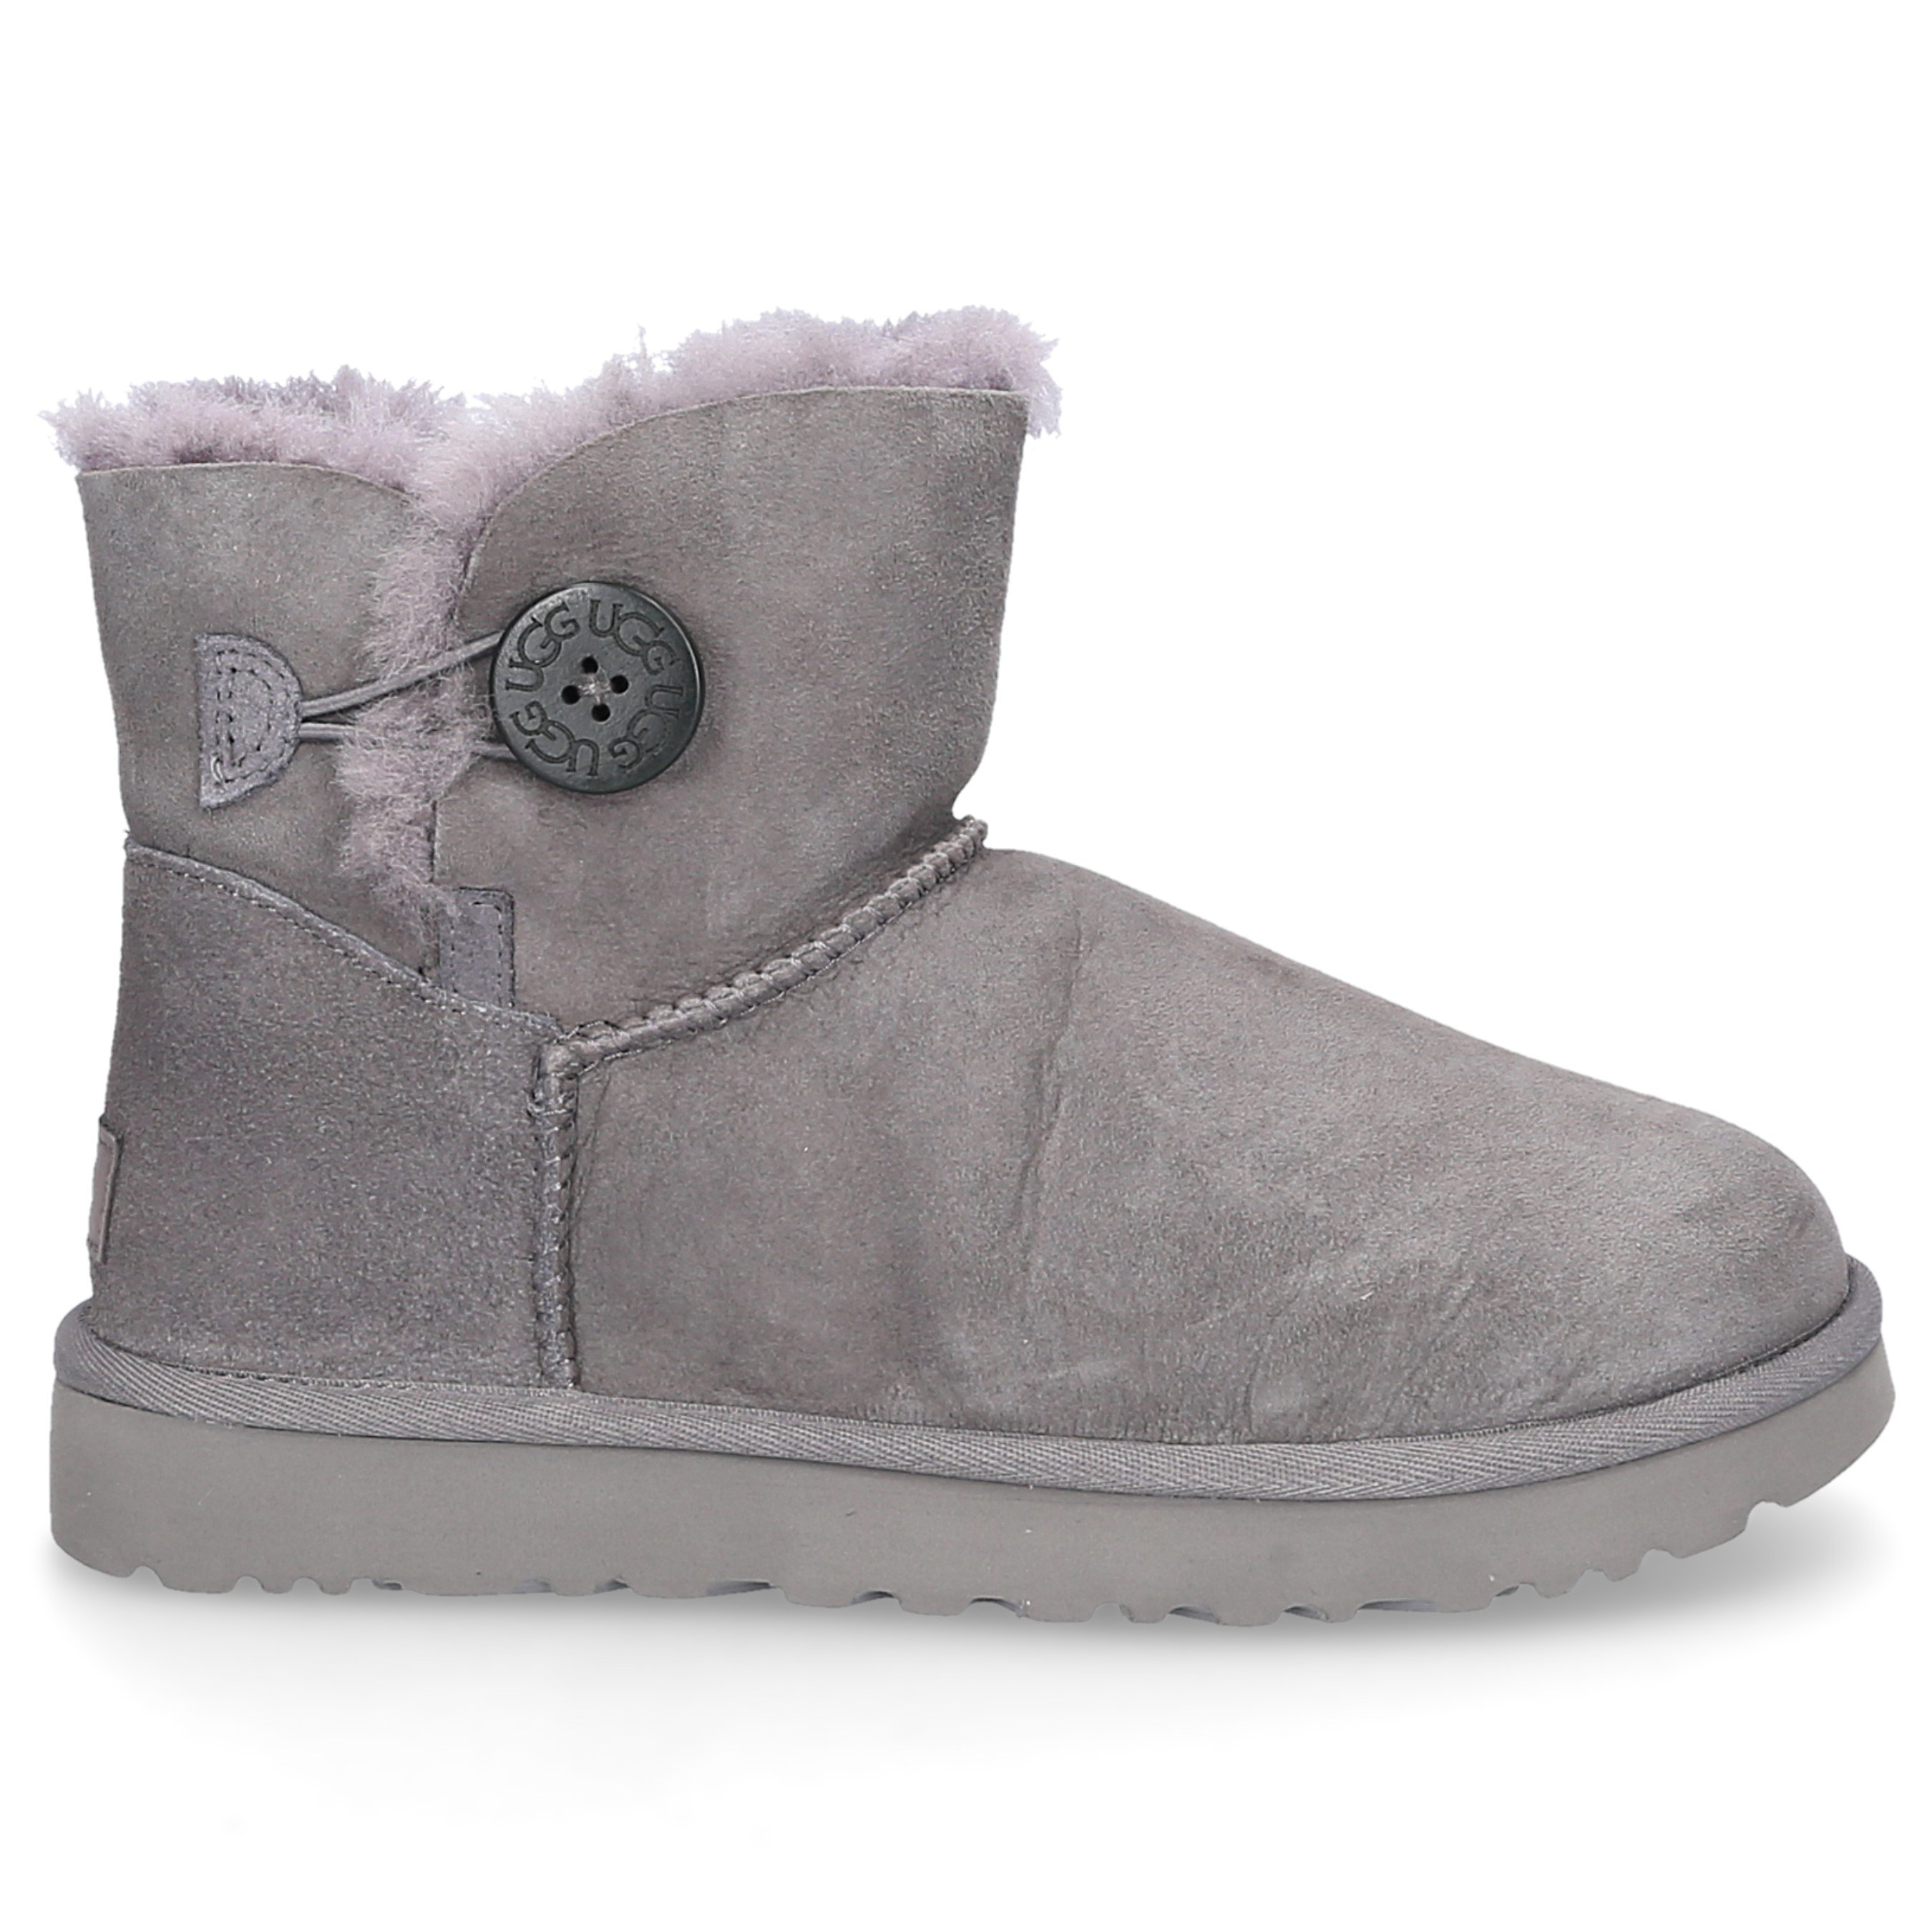 Snowboots Mini Bailey Bow Button Ii Lammleder Grau In Grey